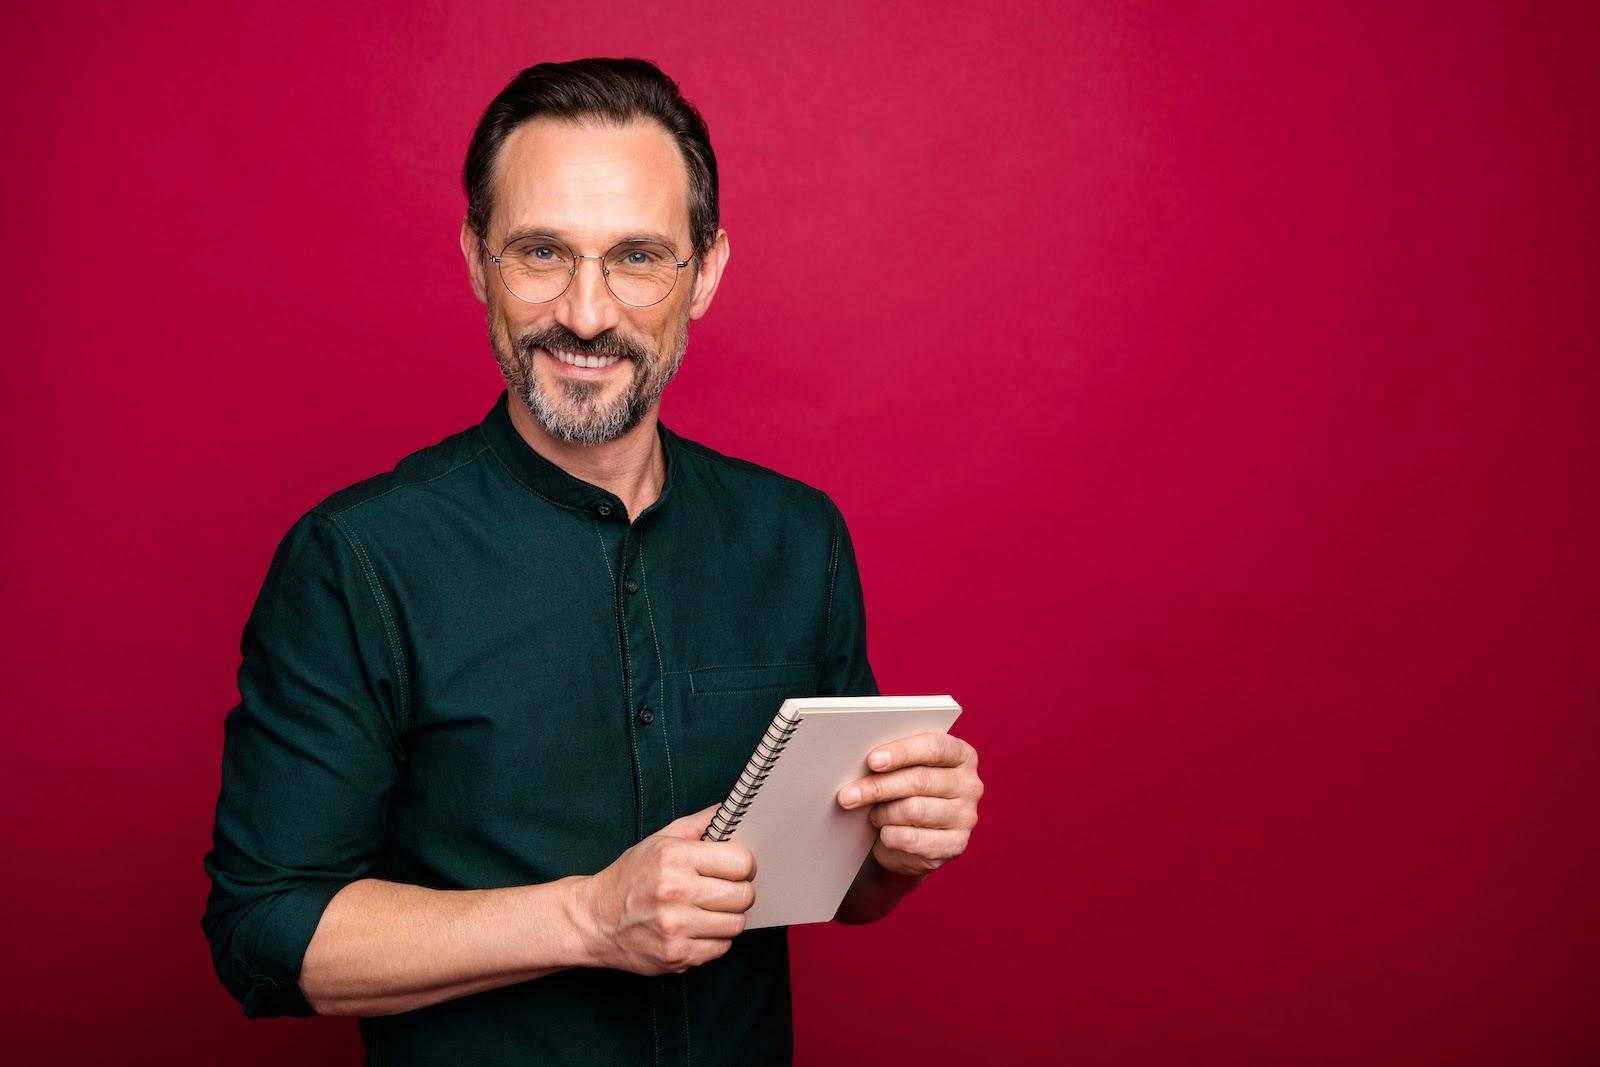 A man plans a virtual meeting etiquette policy